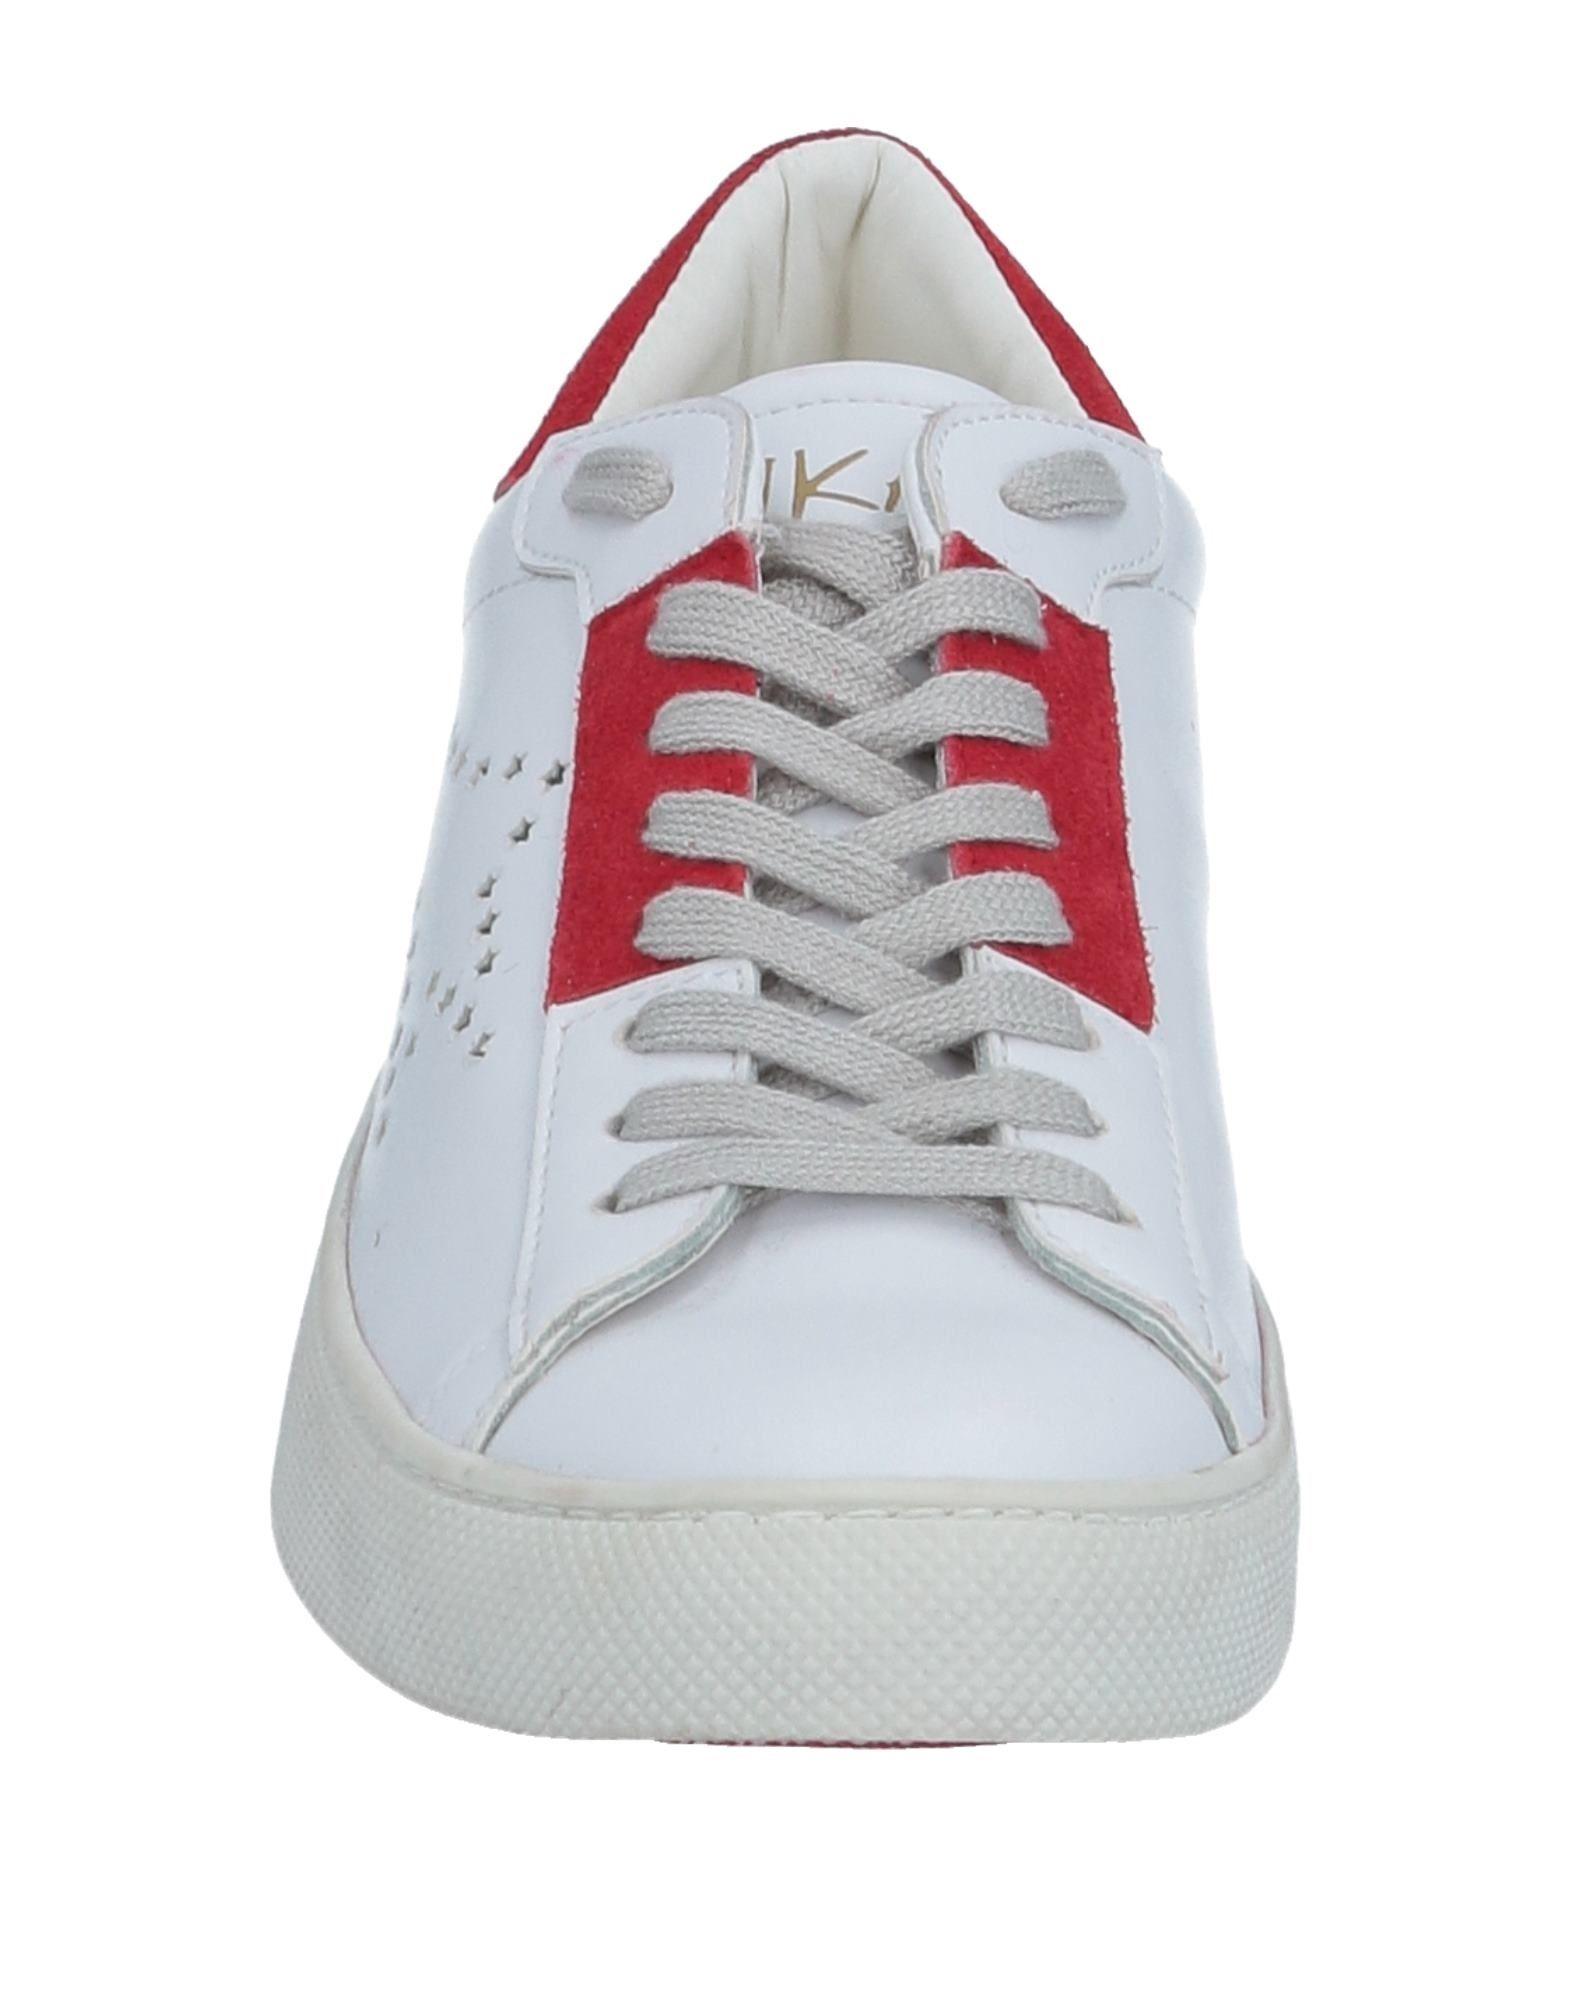 Ishikawa Sneakers Damen beliebte  11520209KE Gute Qualität beliebte Damen Schuhe b38da8